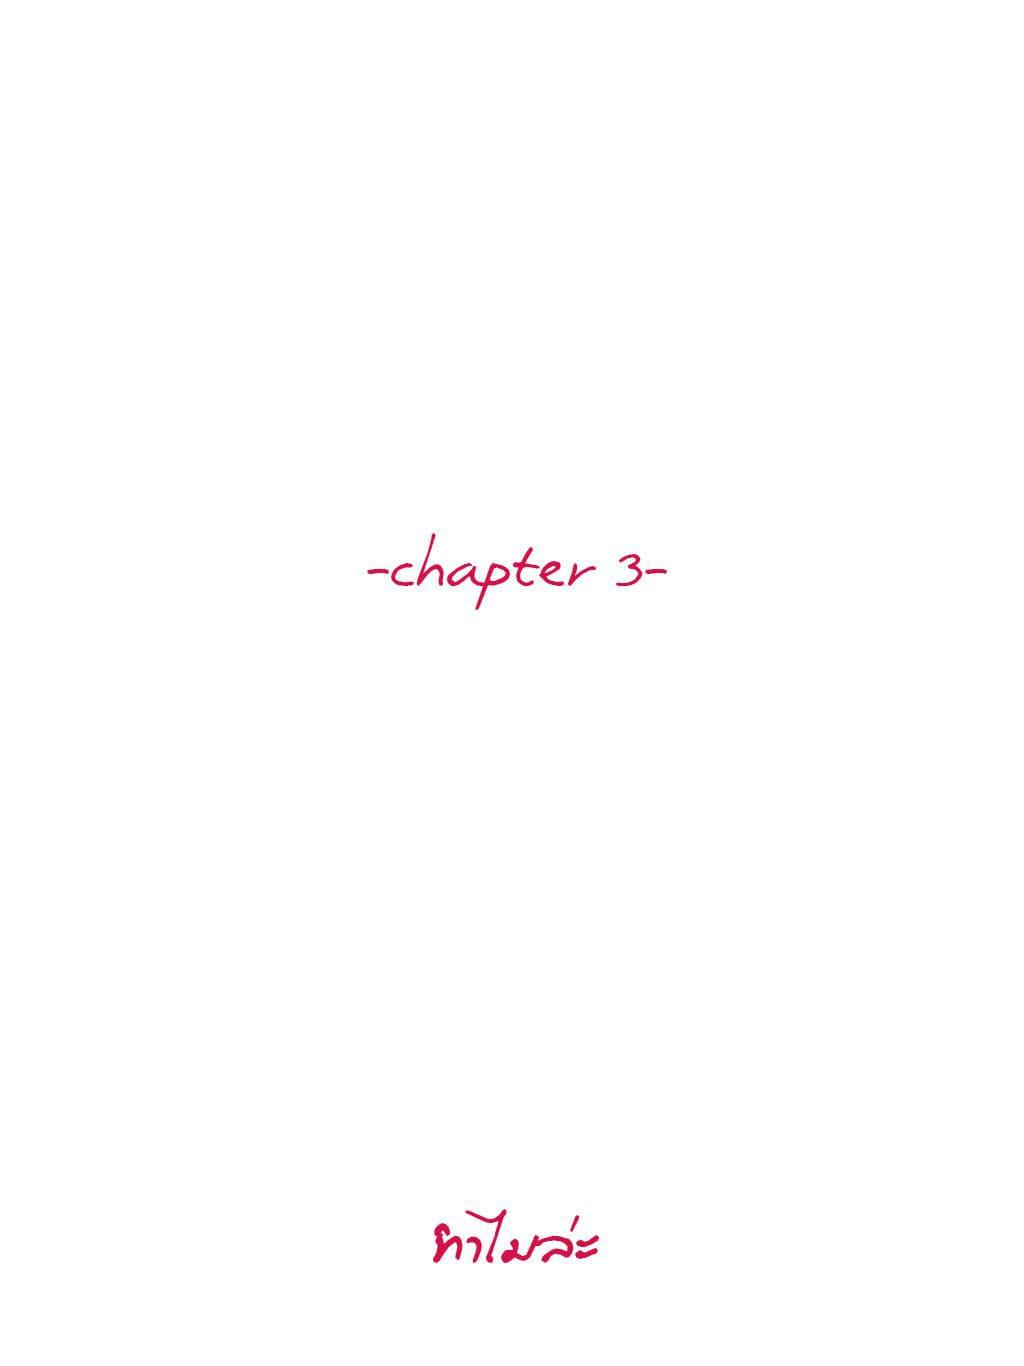 chapter 3 - ทำไมล่ะ